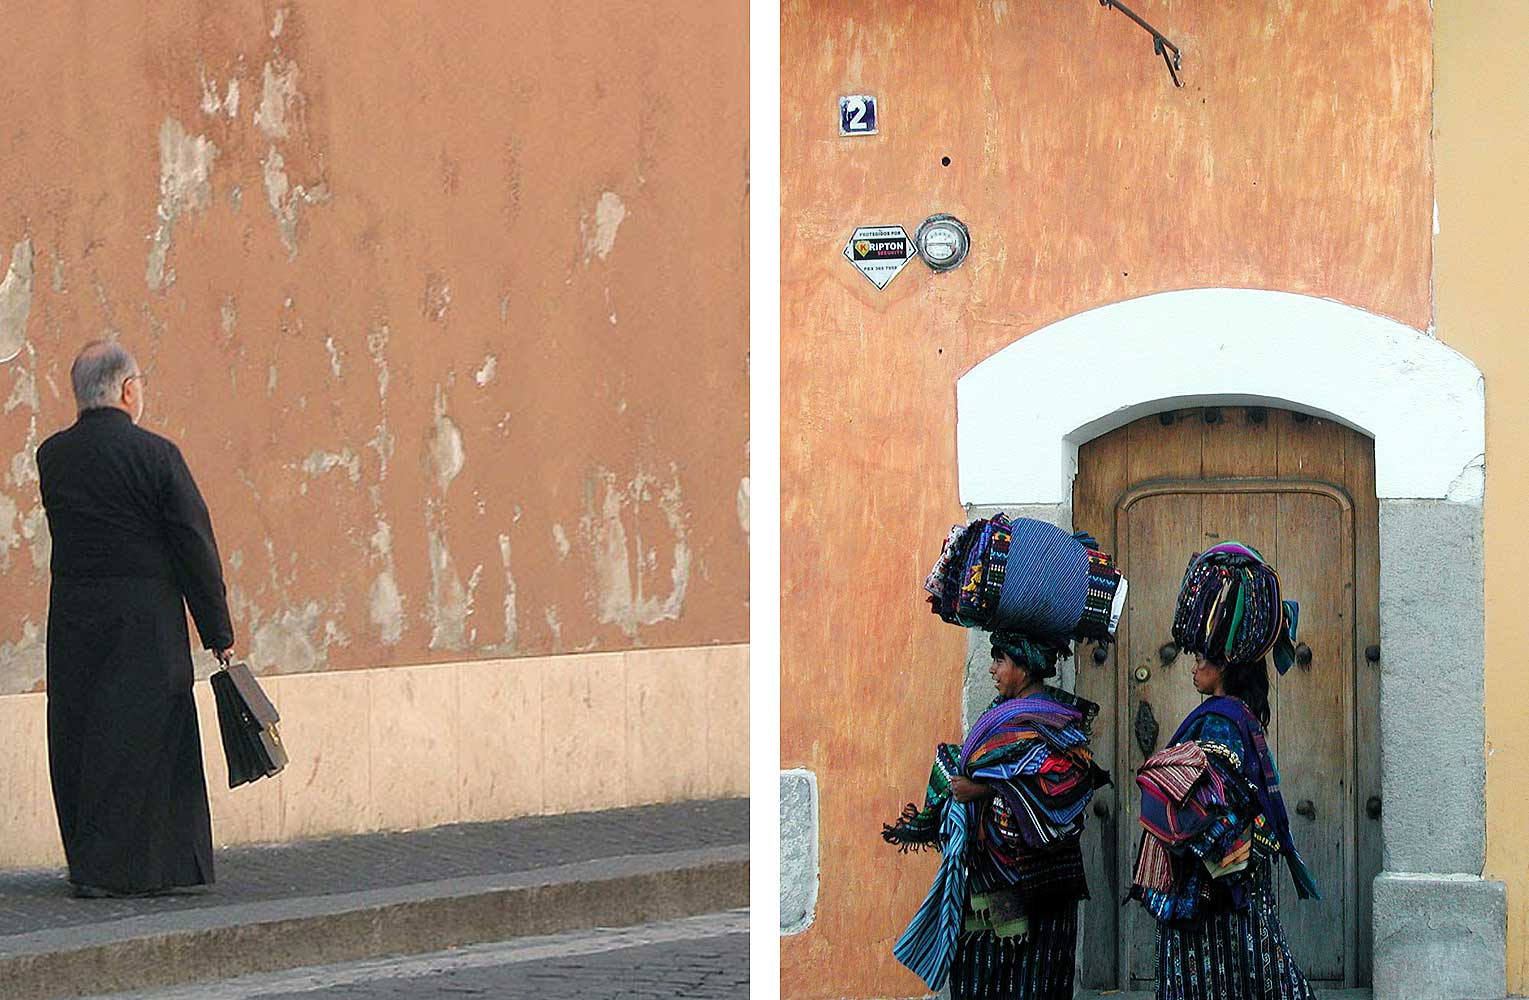 Left: Vatican City, 3 Oct. 2009. Right: Antigua, Guatemala, 4 Jan., 2002.